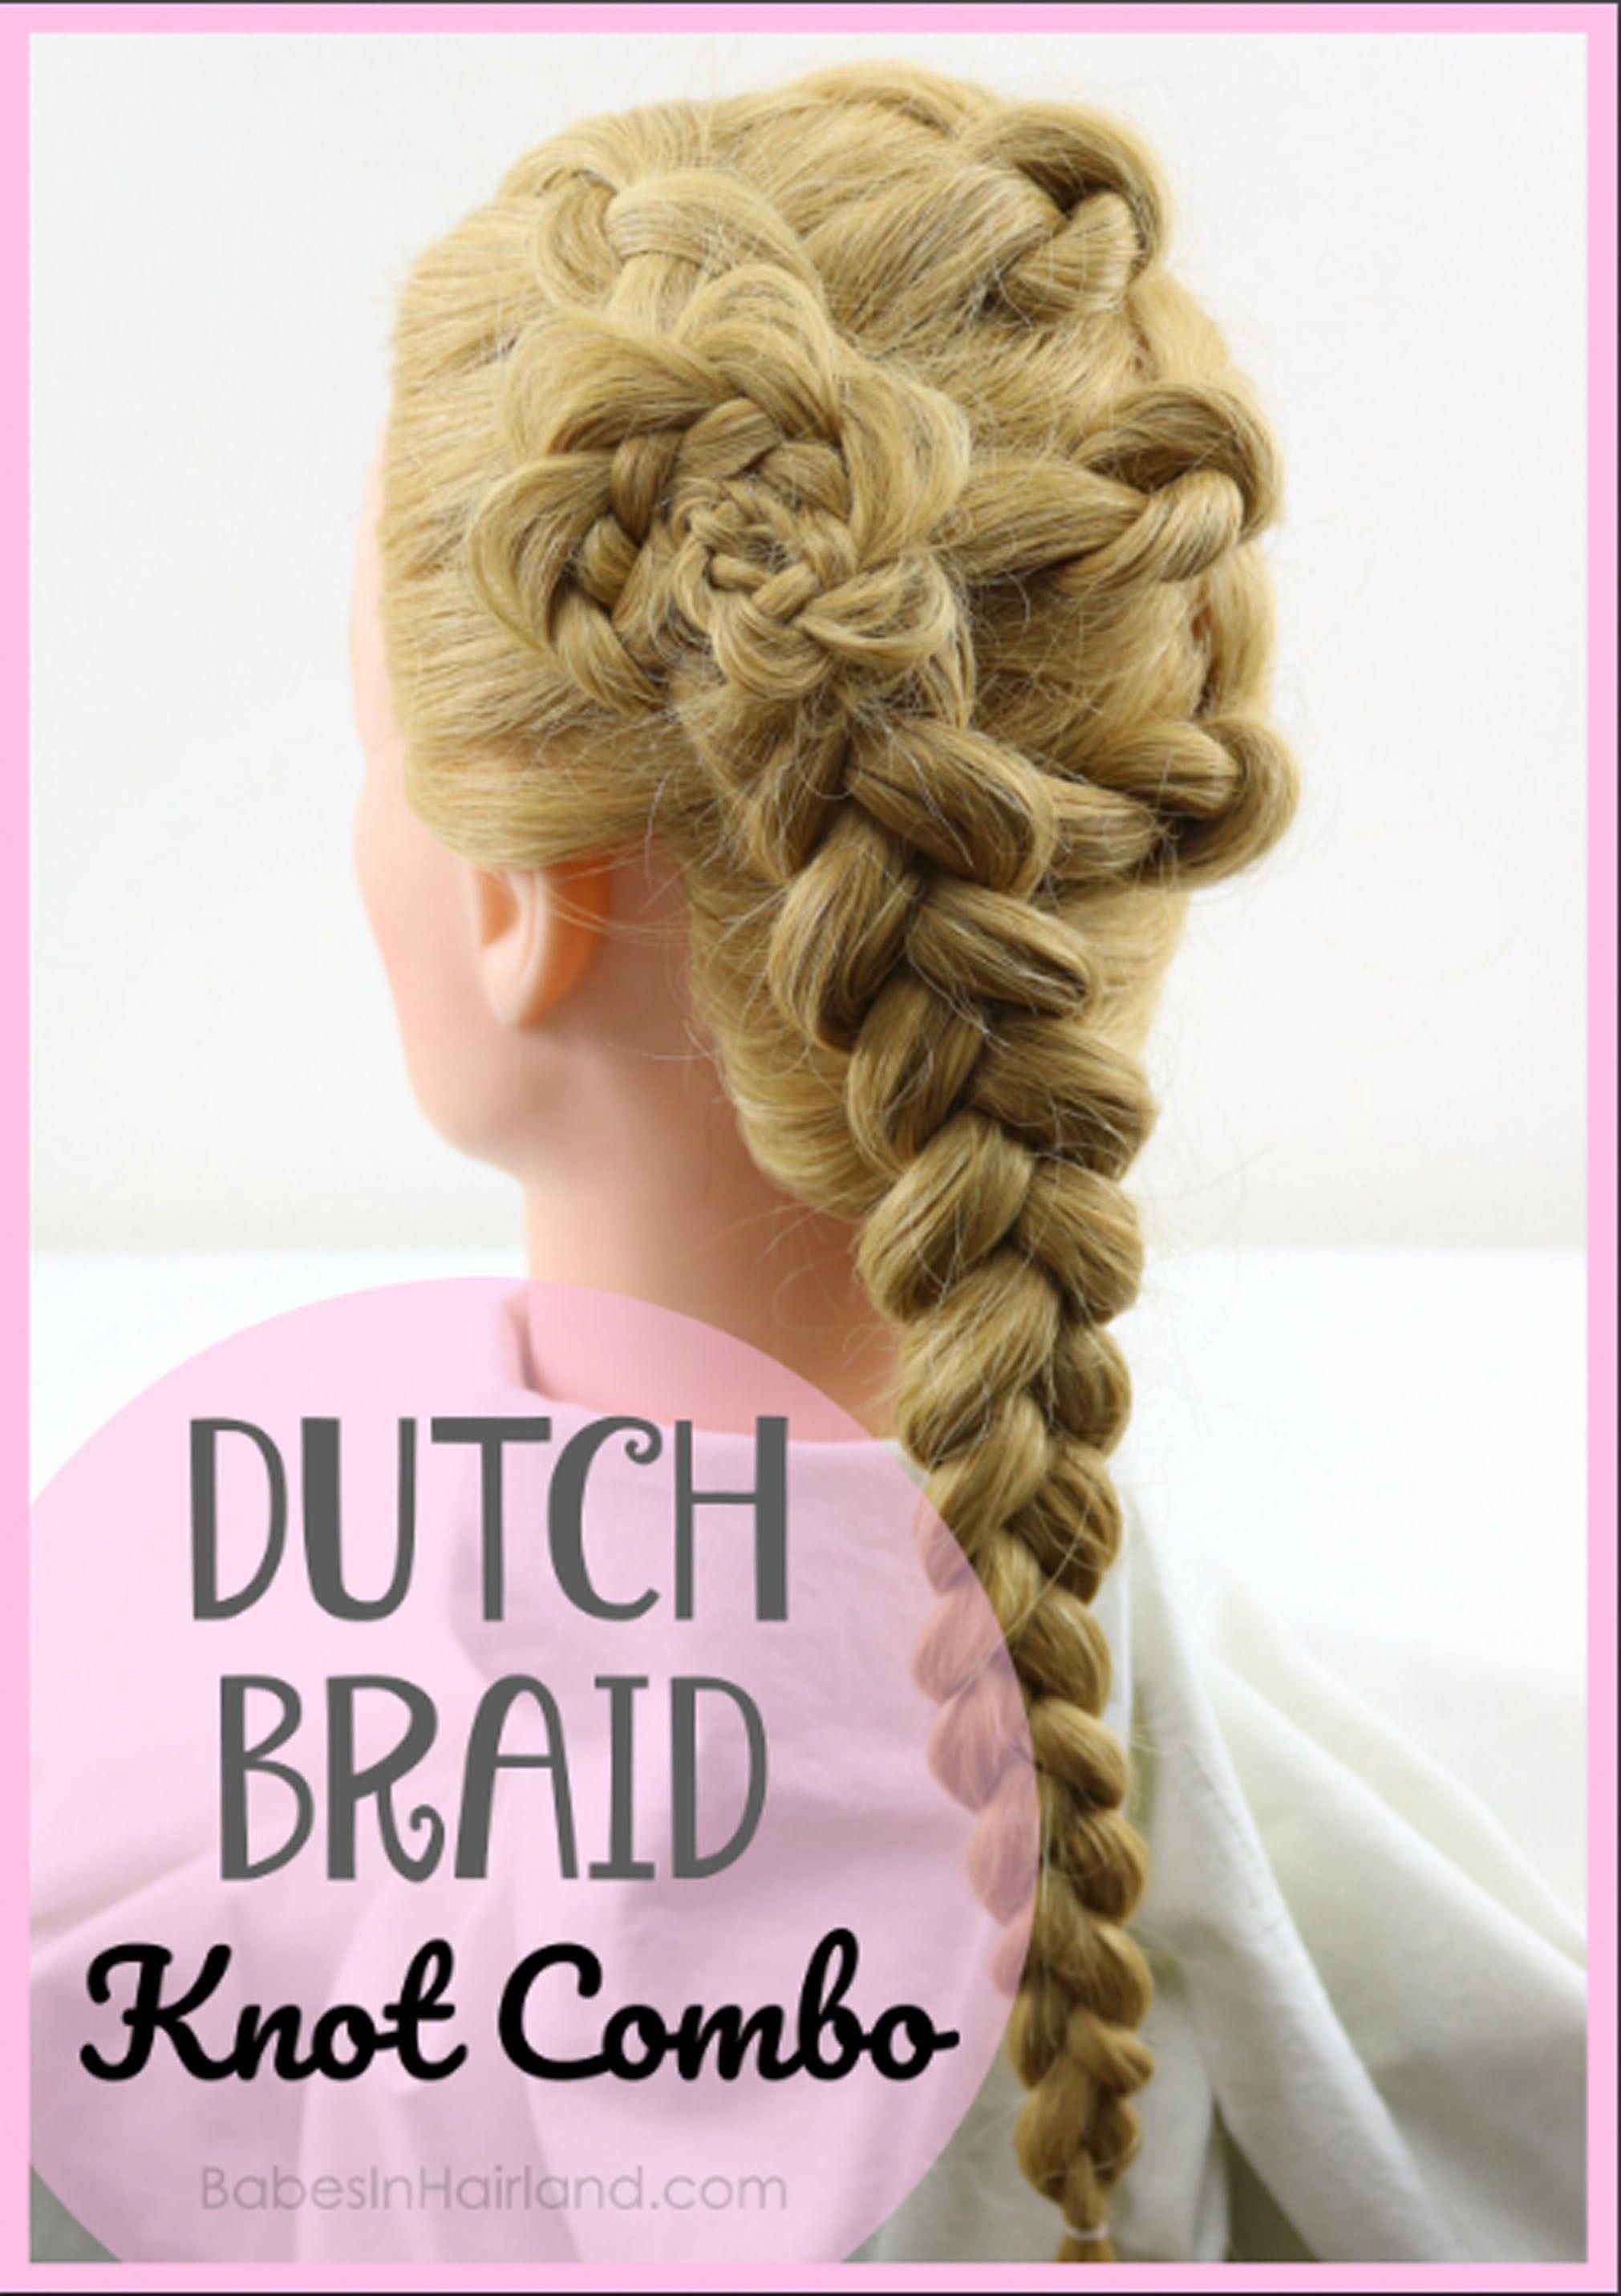 braided hairstyles and names #braidedhairstyles | braided